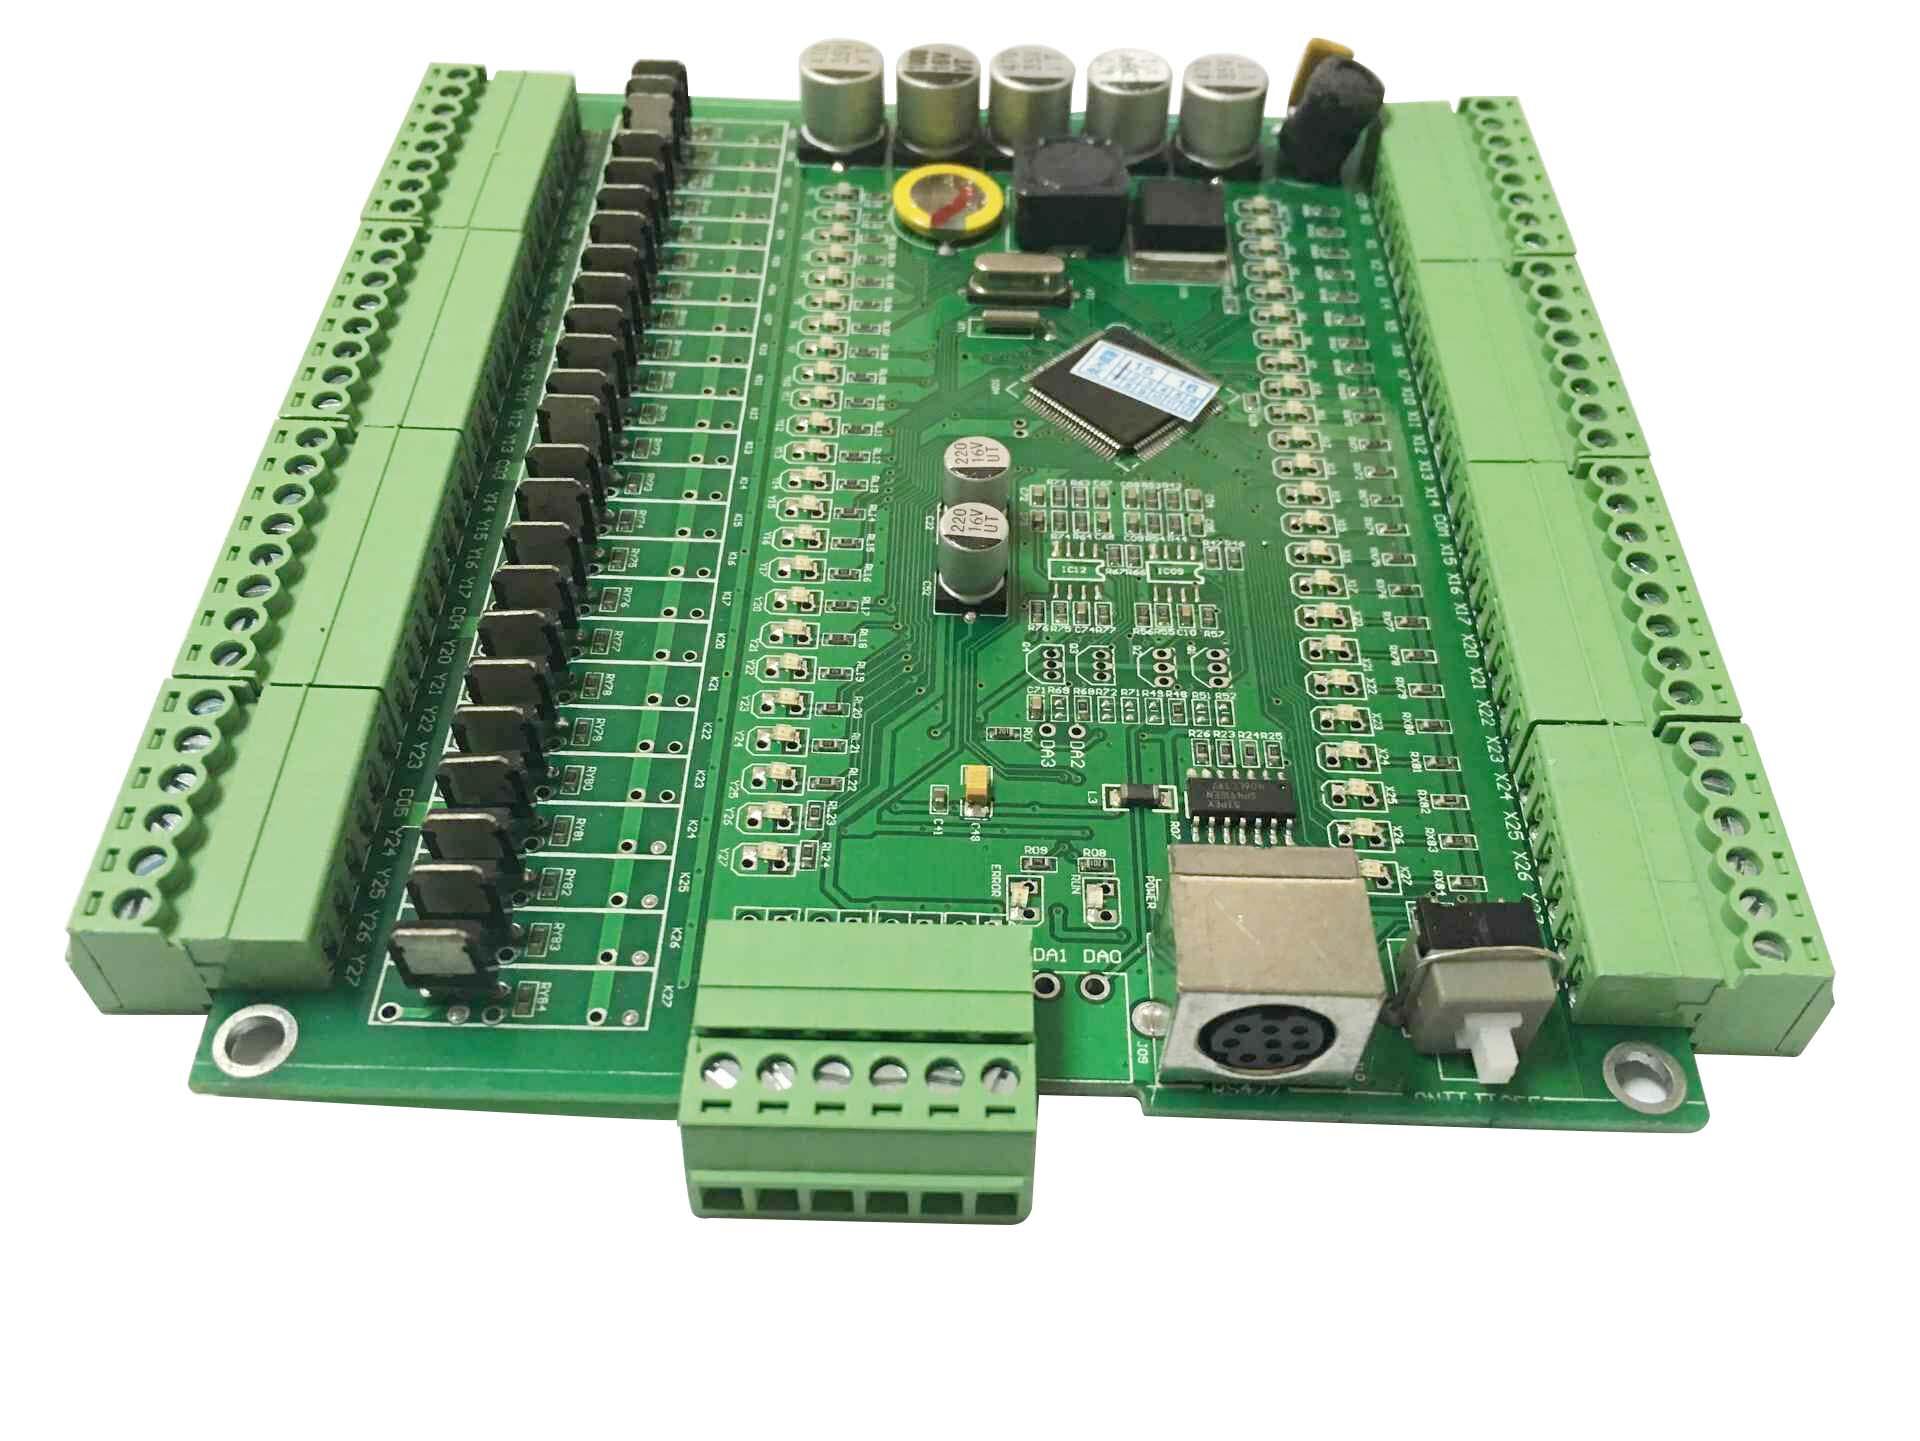 顾美 三菱FX2N-48MT的板式PLC DX2N-48MT